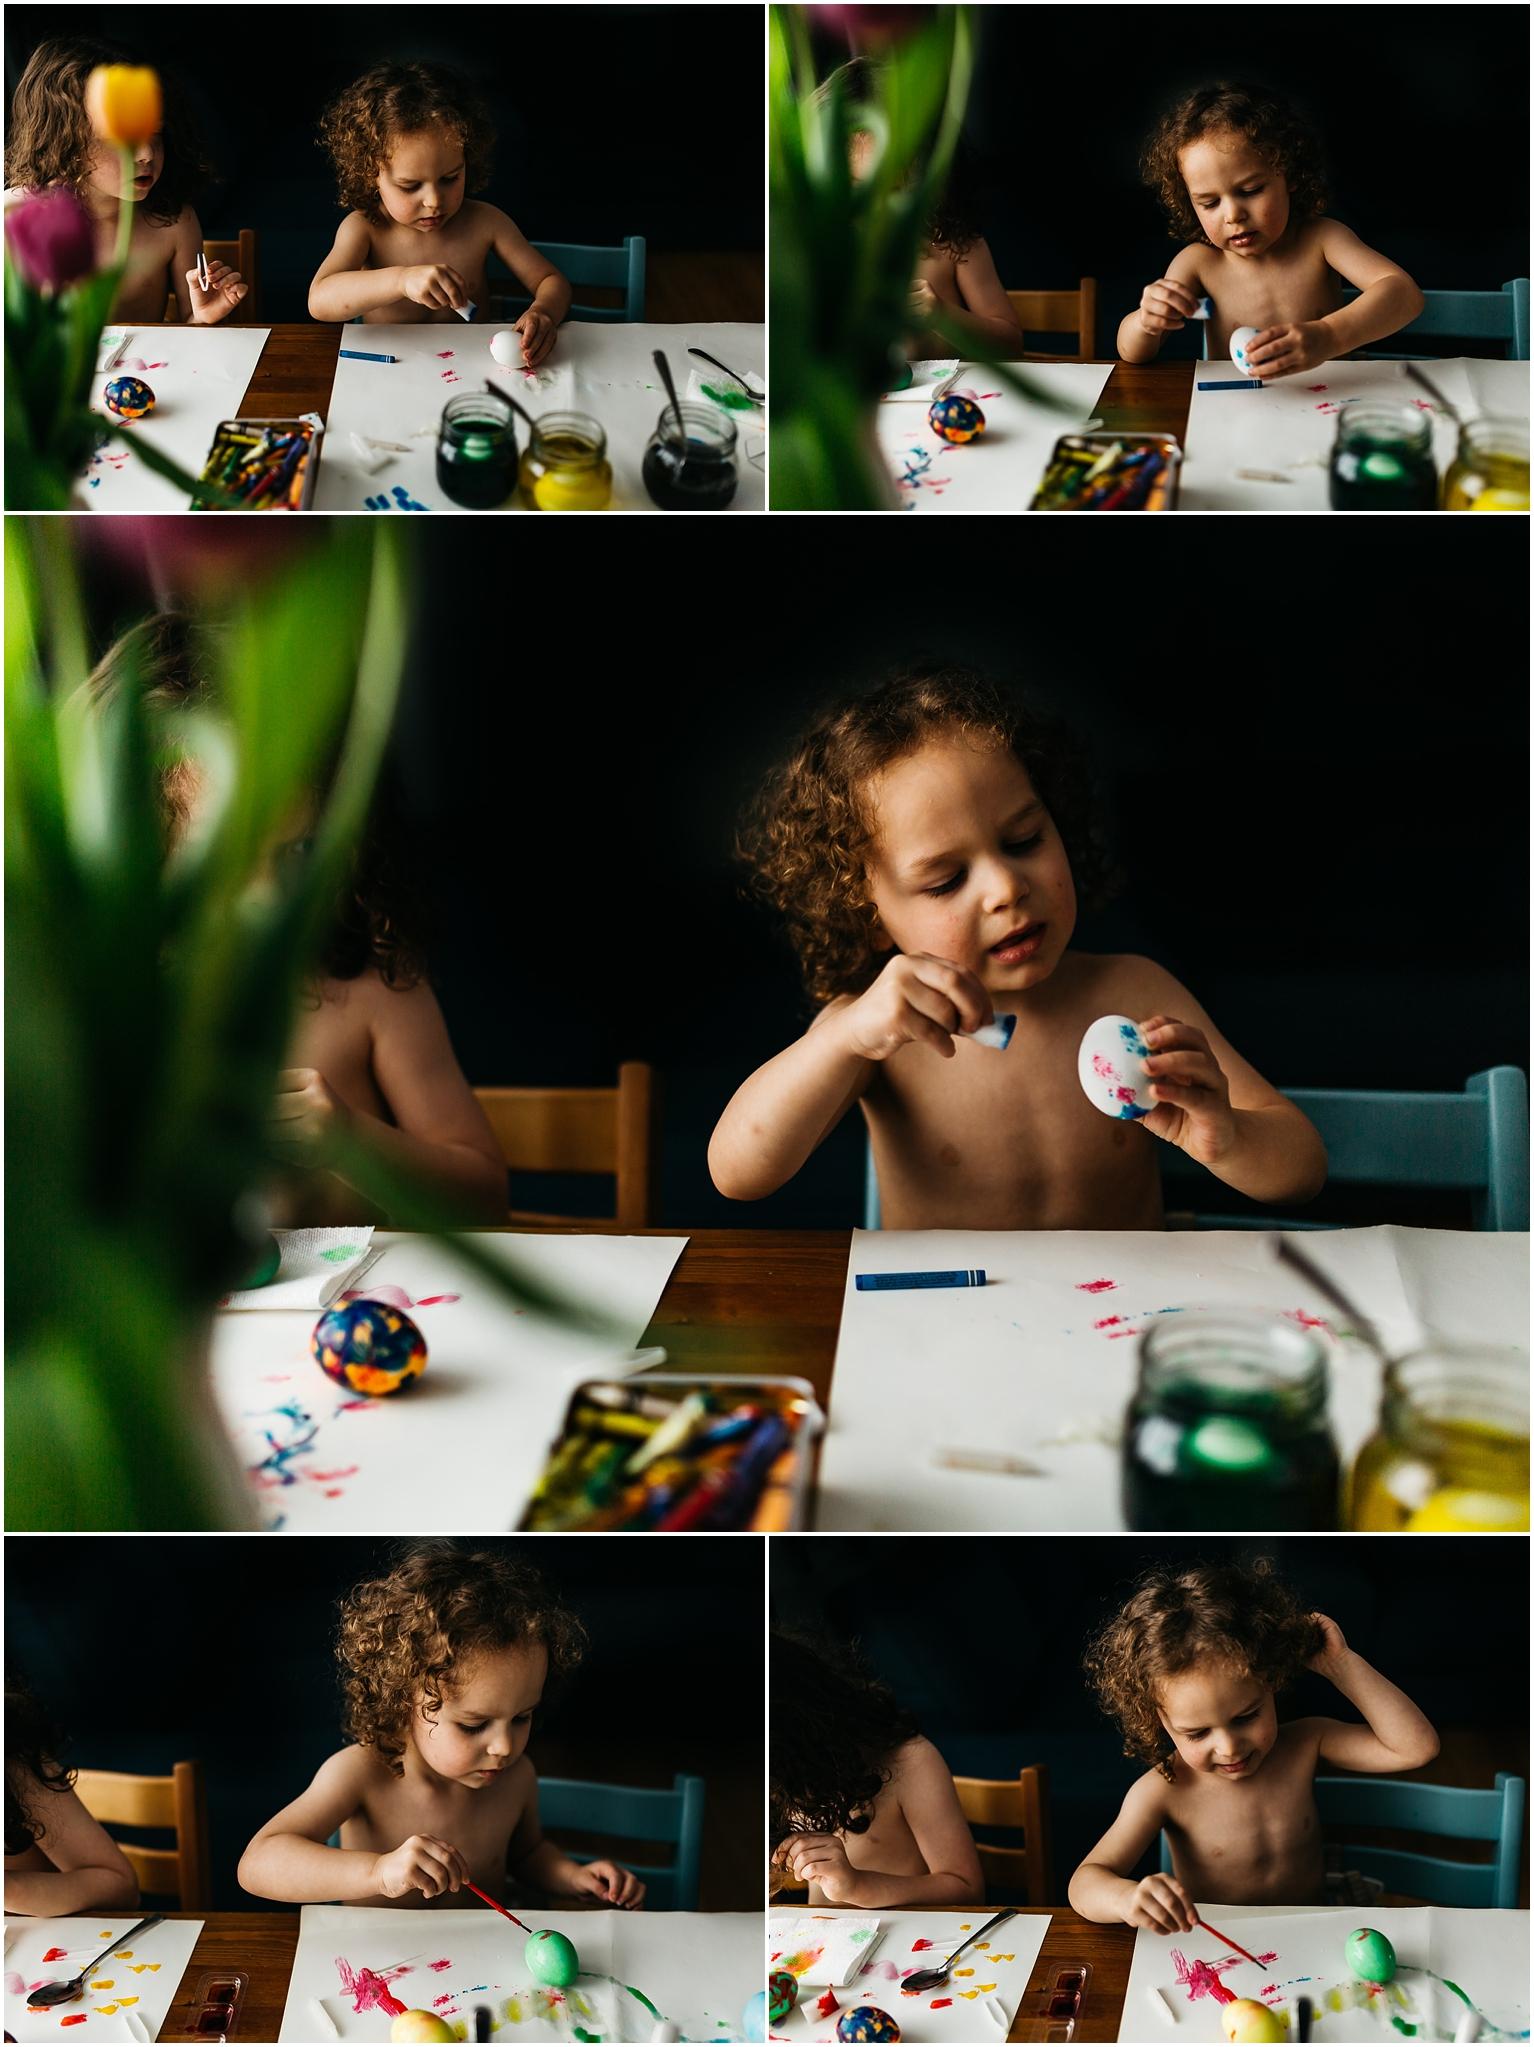 Easter Egg Painting - Edmonton Photographer - Edmonton Family Photographer -  Easter Eggs - Easter 2018 - Crayons on Easter Eggs - Edmonton Documentary Photographer - Family Photography - Documentary Photography - Tulips - Stokke Tripp Trapp - Tulips - Spring Flowers - Paas Easter Kits